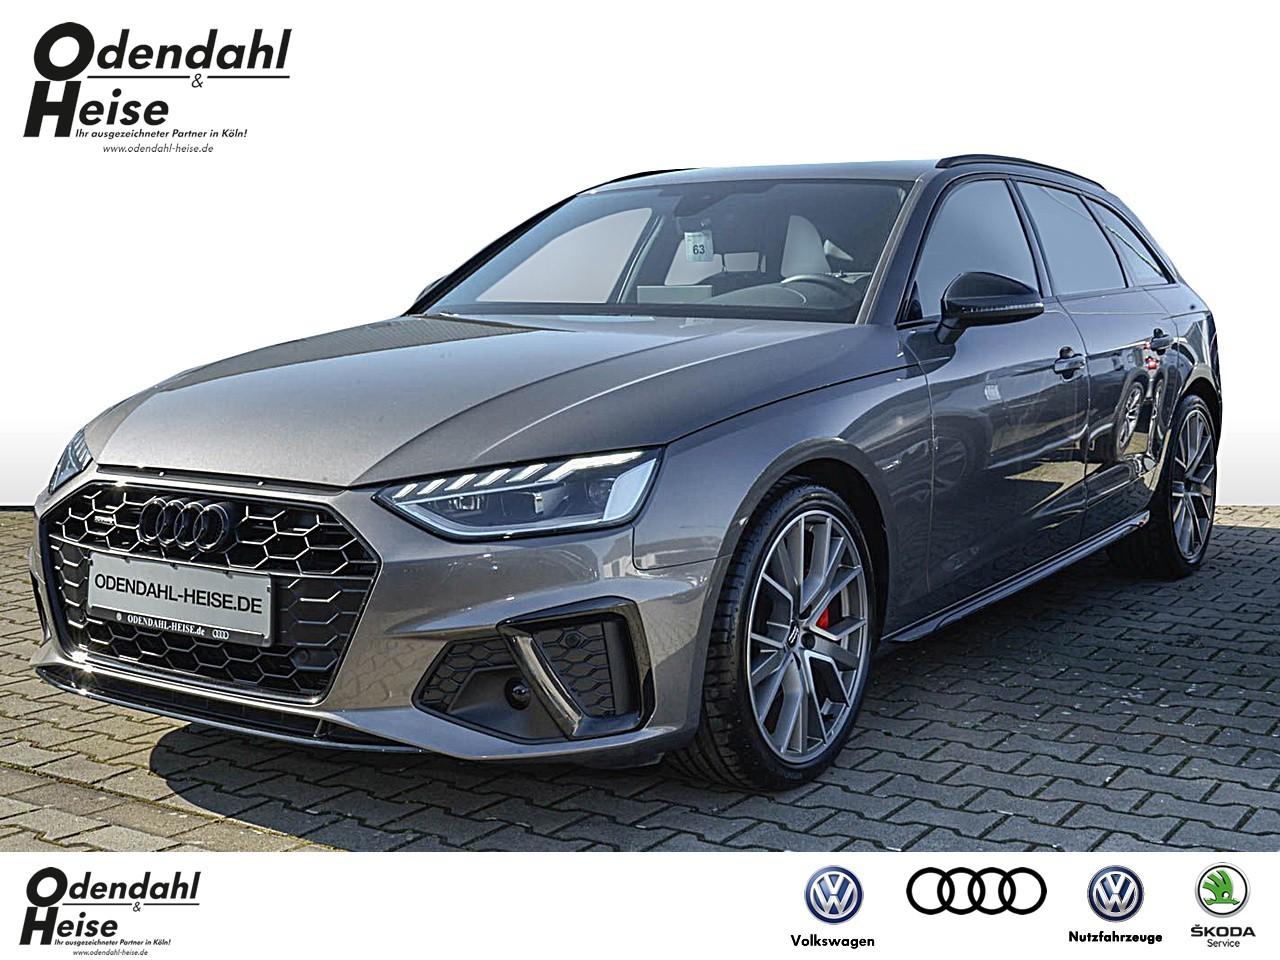 Audi A4 Avant Launch Edition 40 TDI quattro 140(190) kW(PS) S tronic, Jahr 2019, Diesel